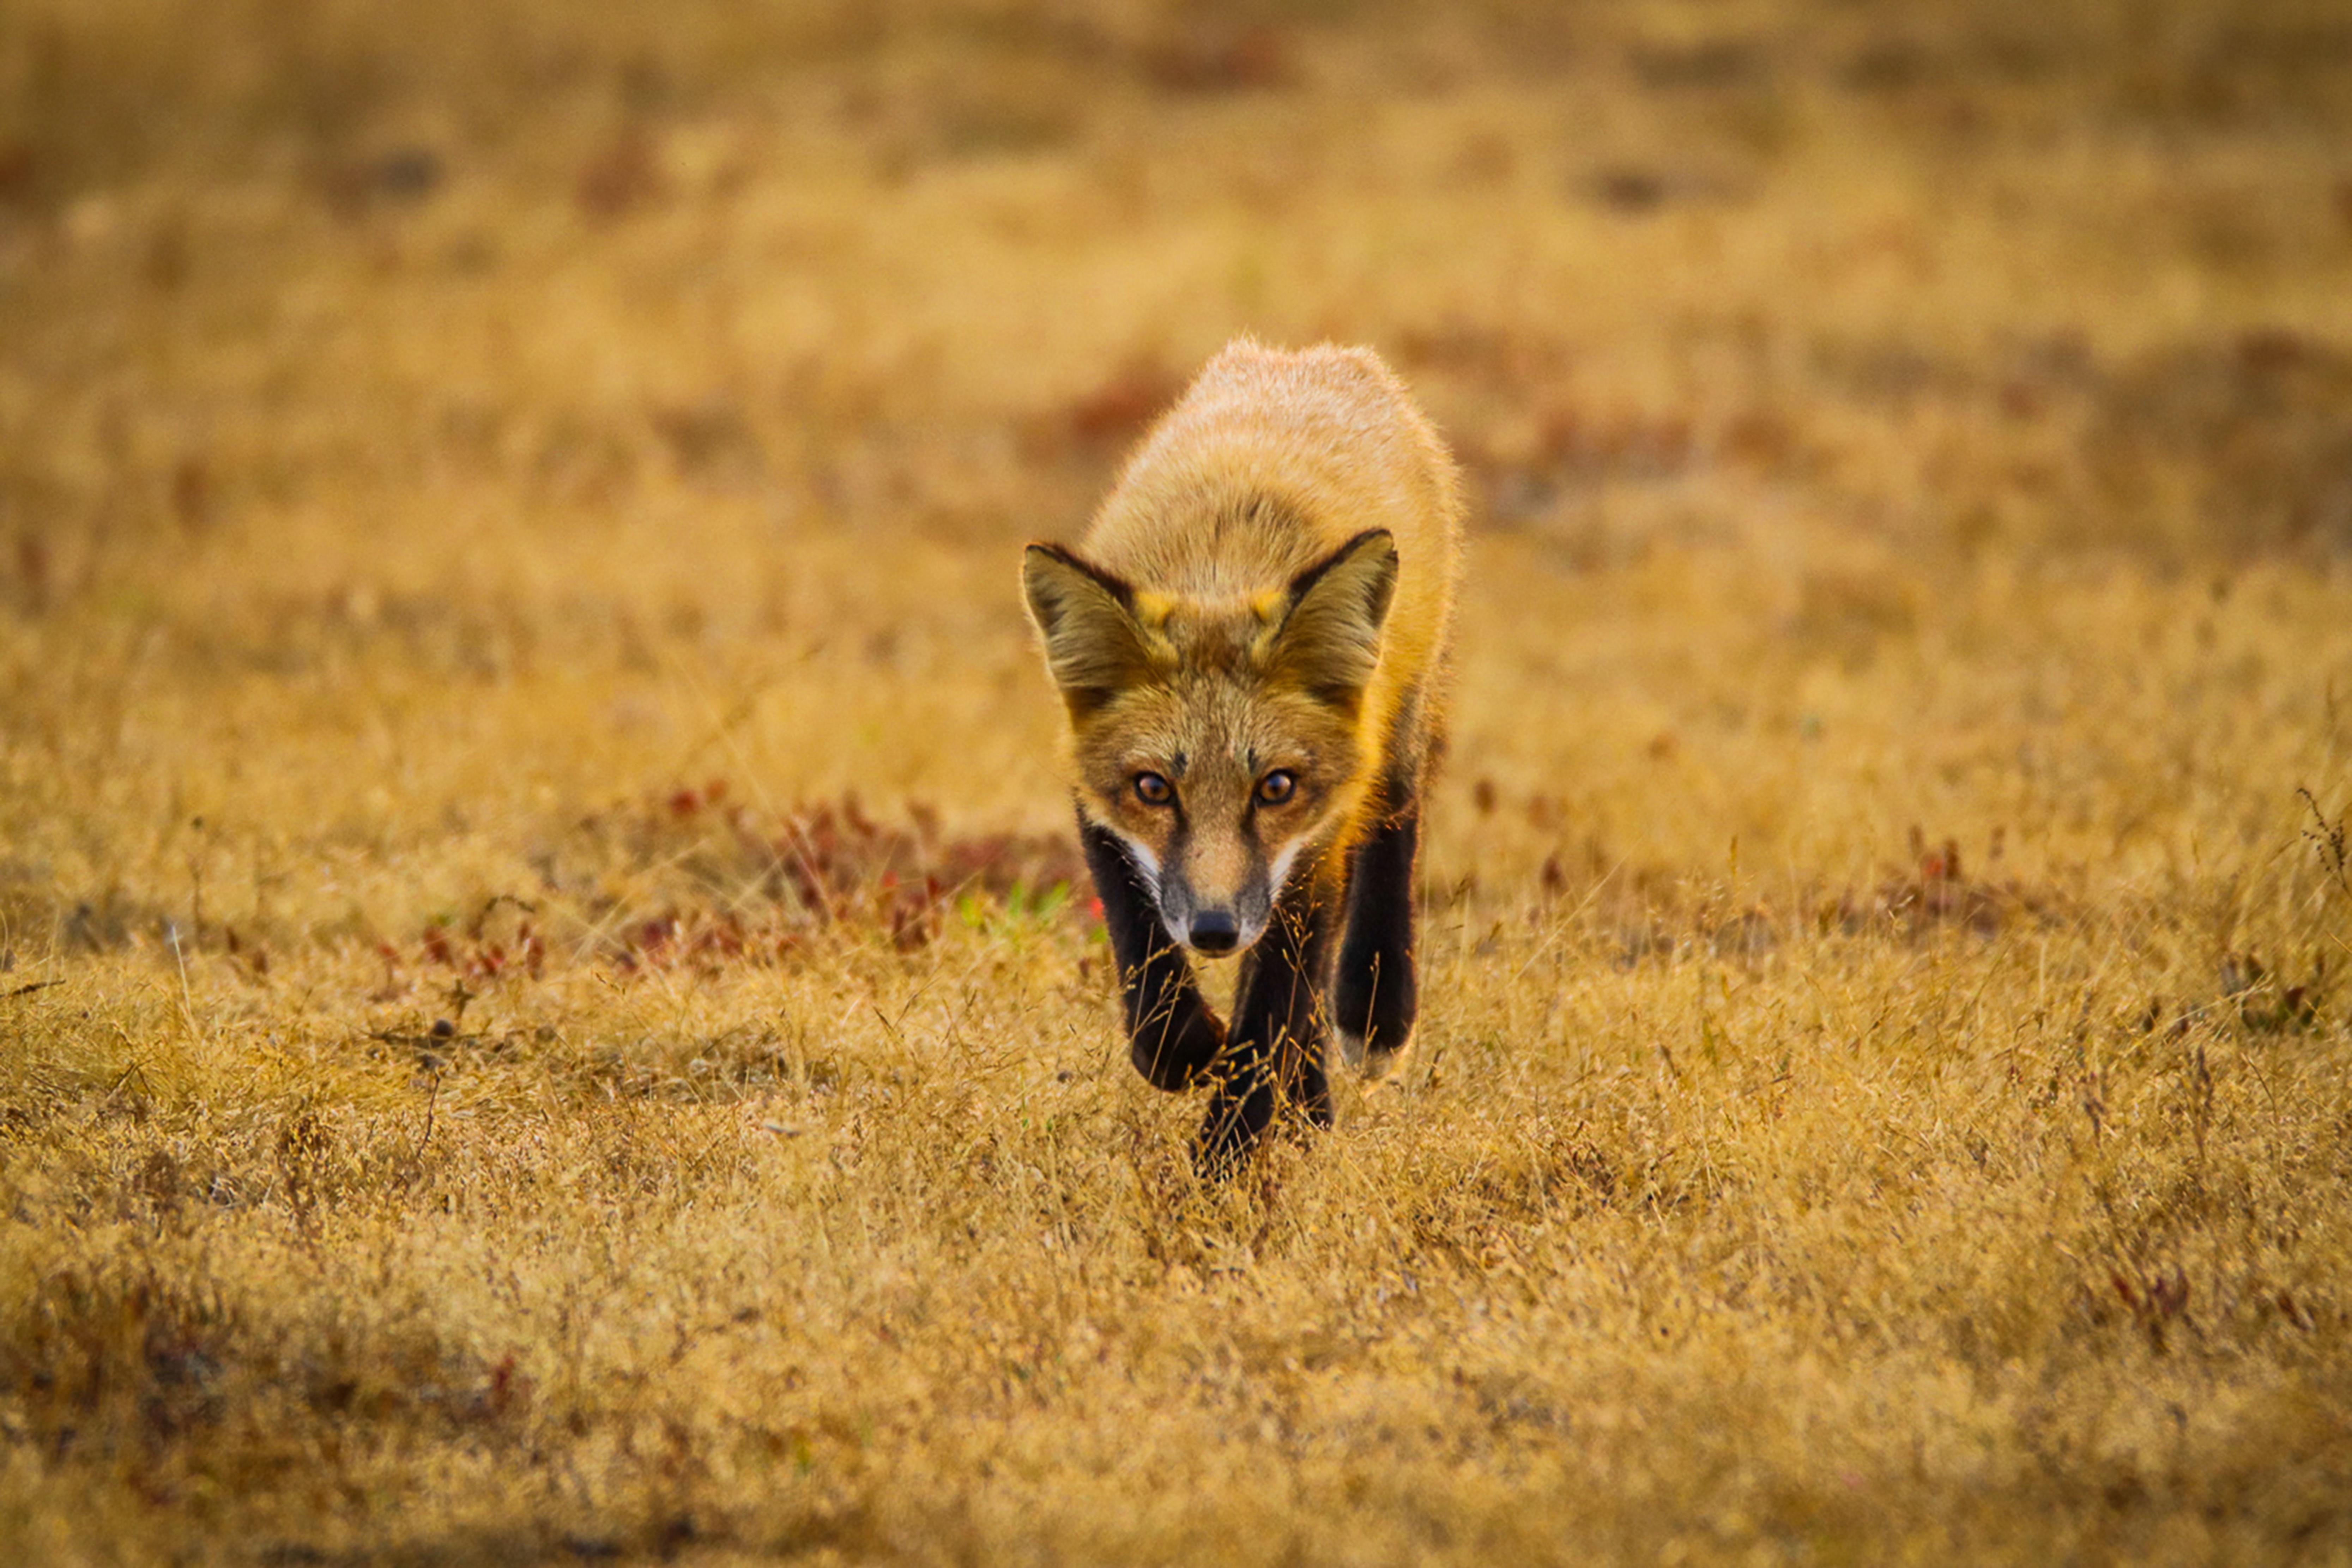 foxtrotseb-1559754641-60.jpg